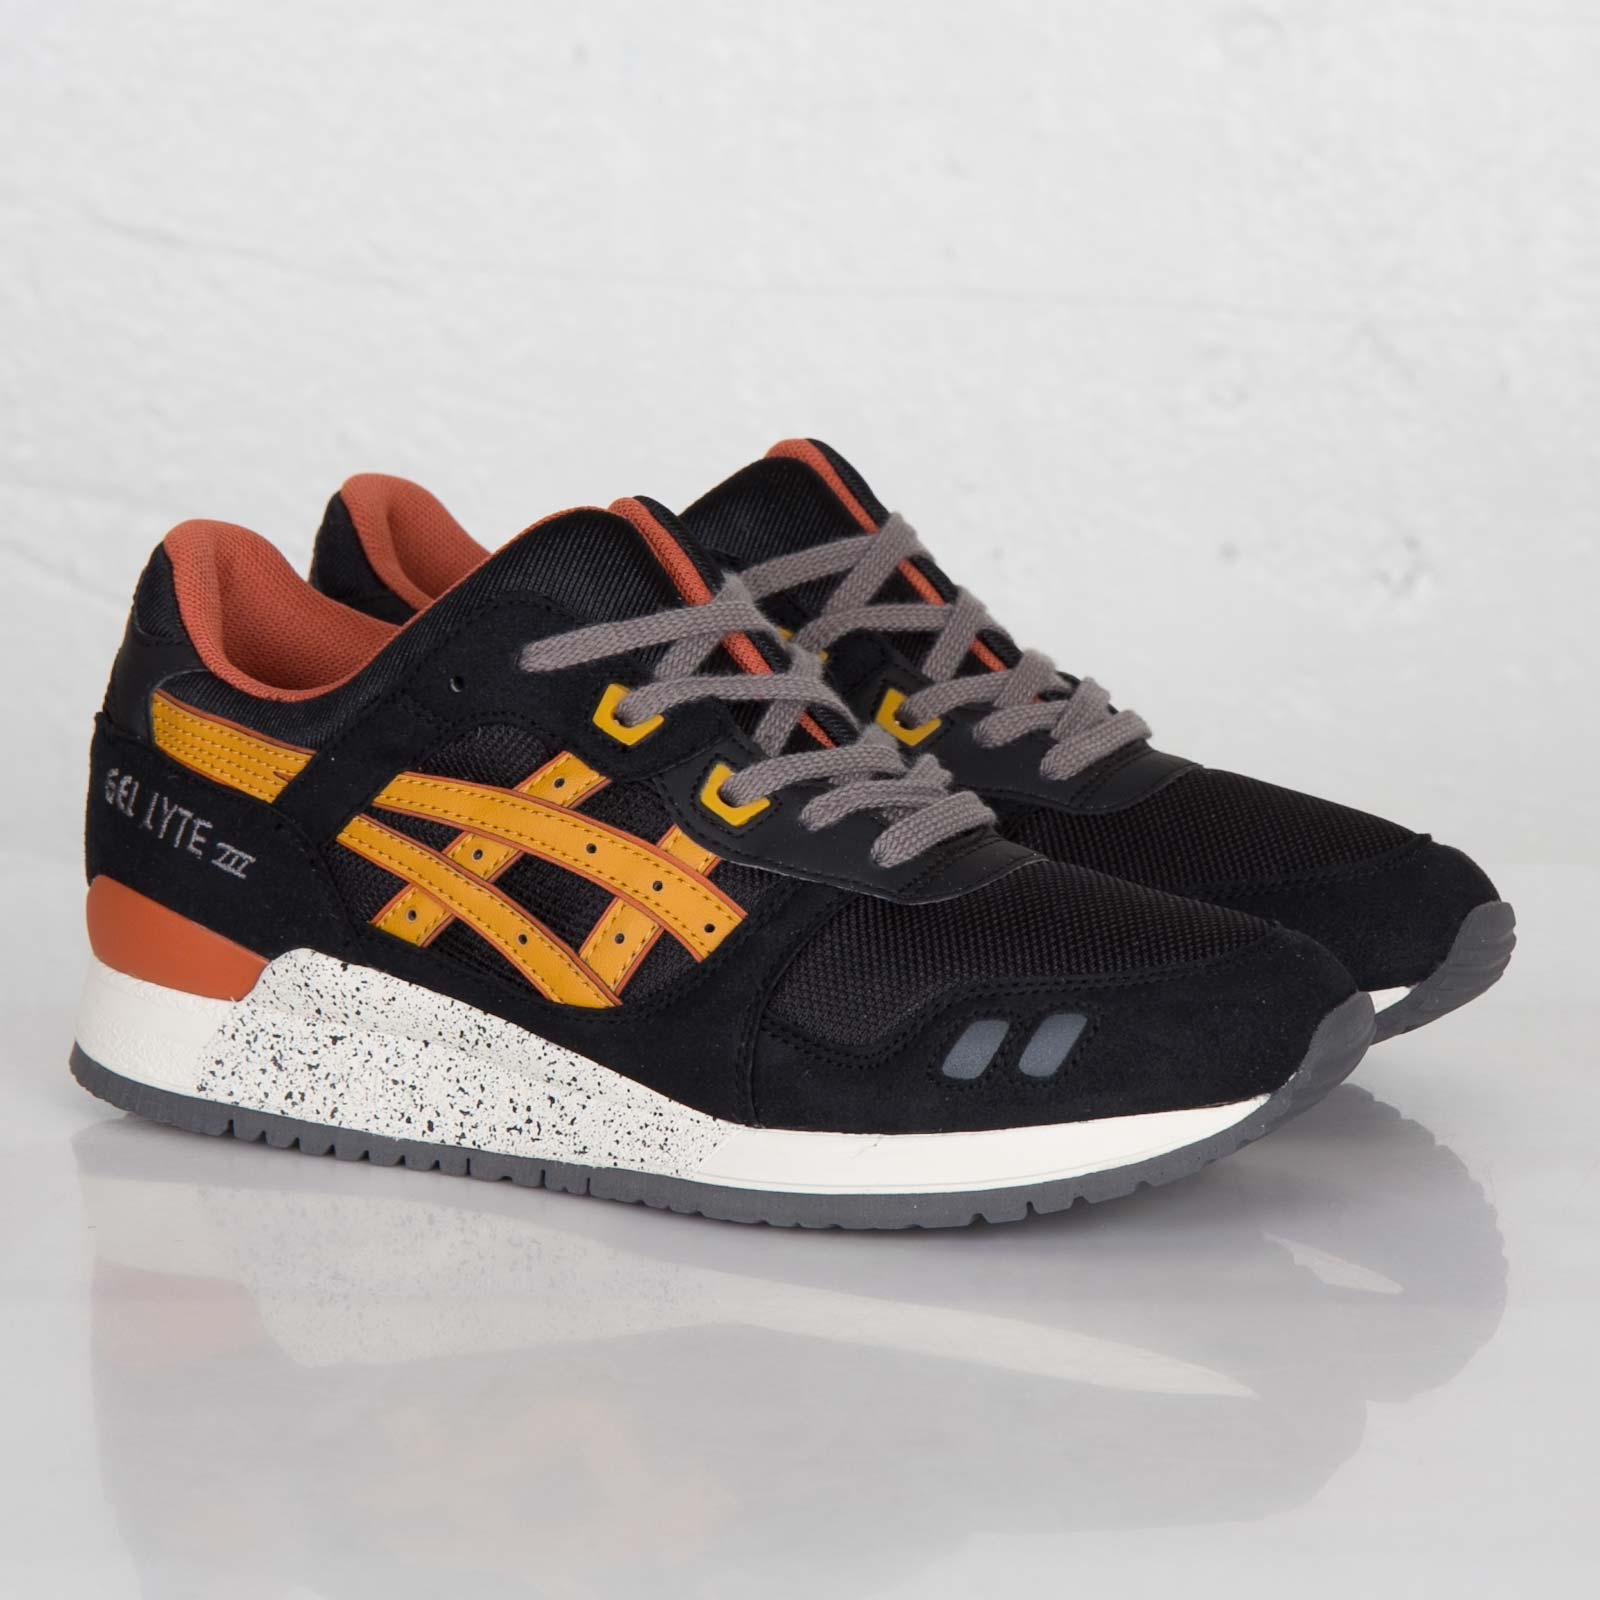 133d34c0b4a ASICS Tiger Gel-Lyte III - H307n-9071 - Sneakersnstuff